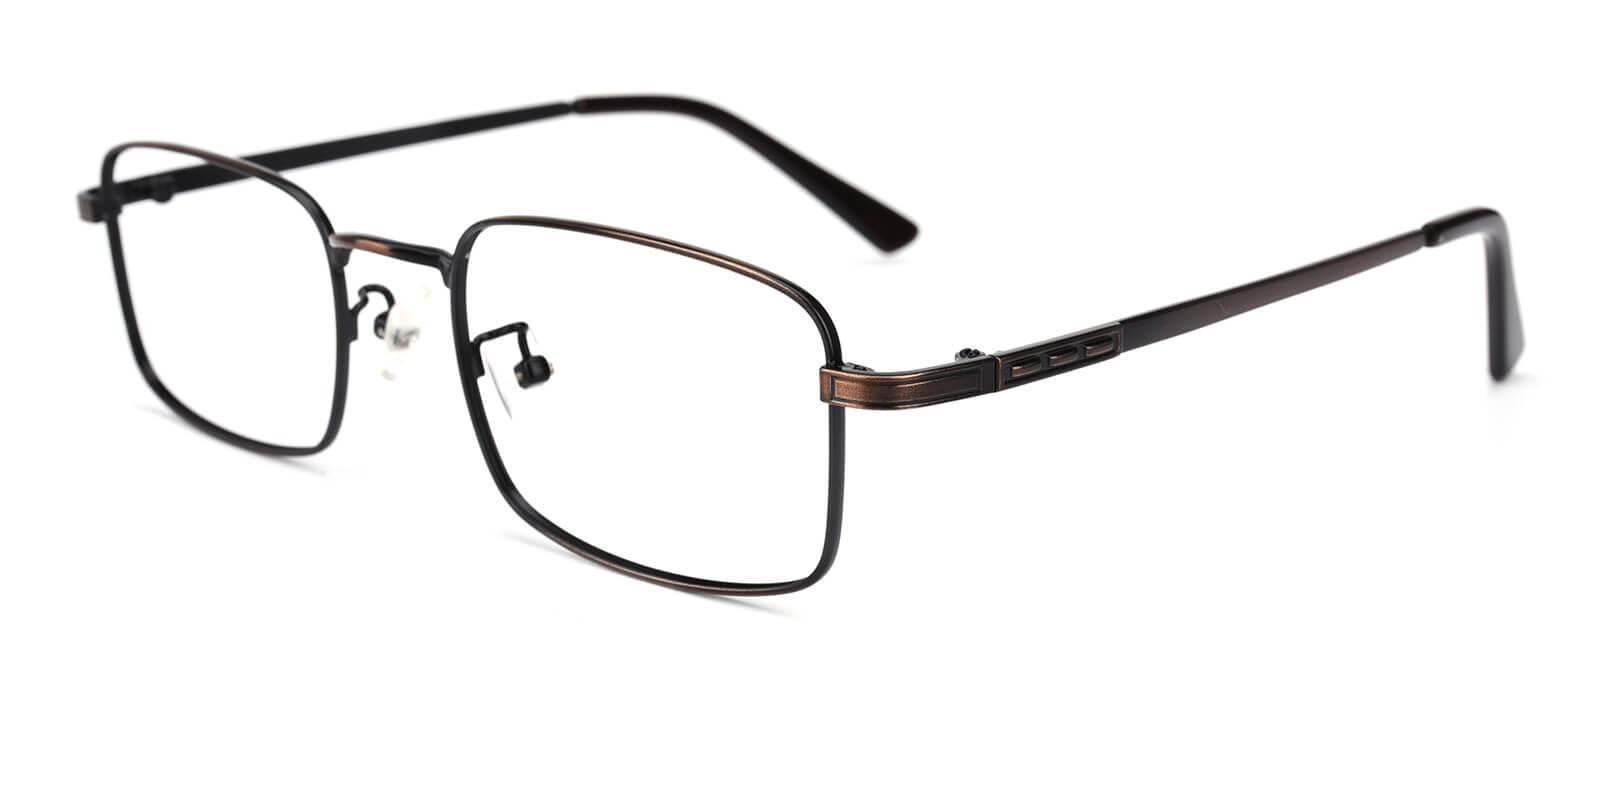 Edmonton-Brown-Rectangle-Metal-Eyeglasses-additional1